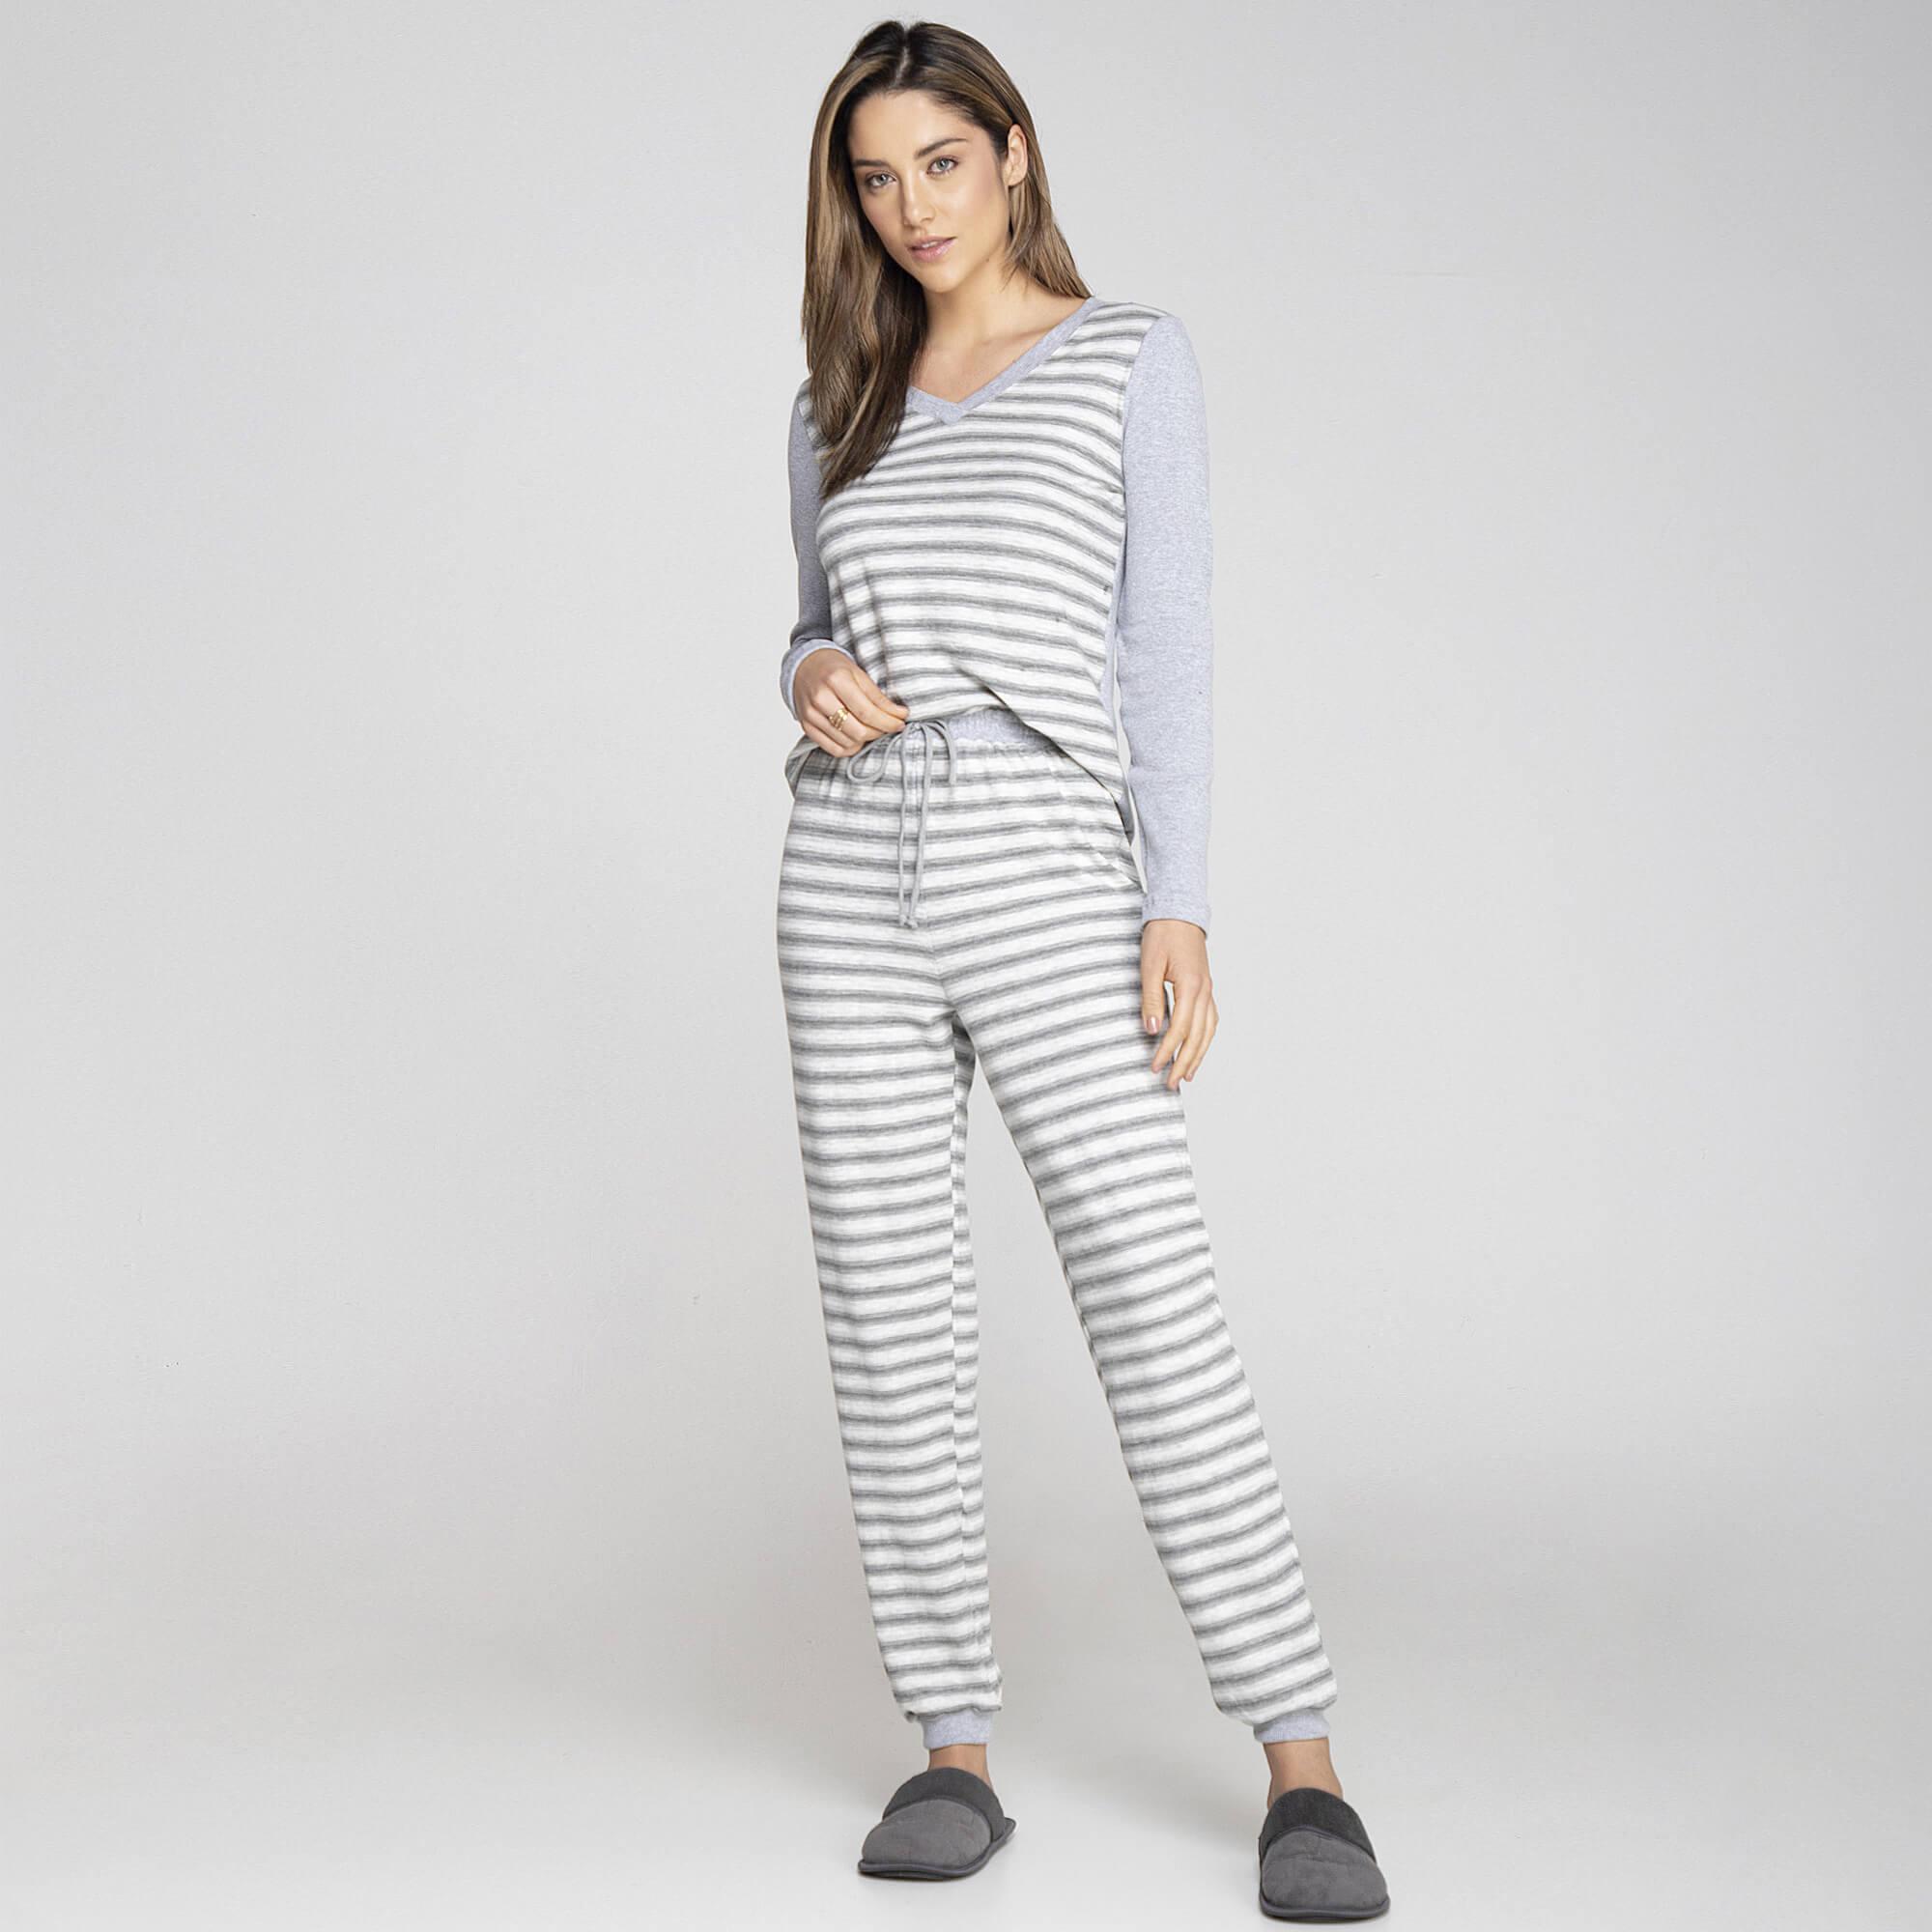 Pijama listras decote V